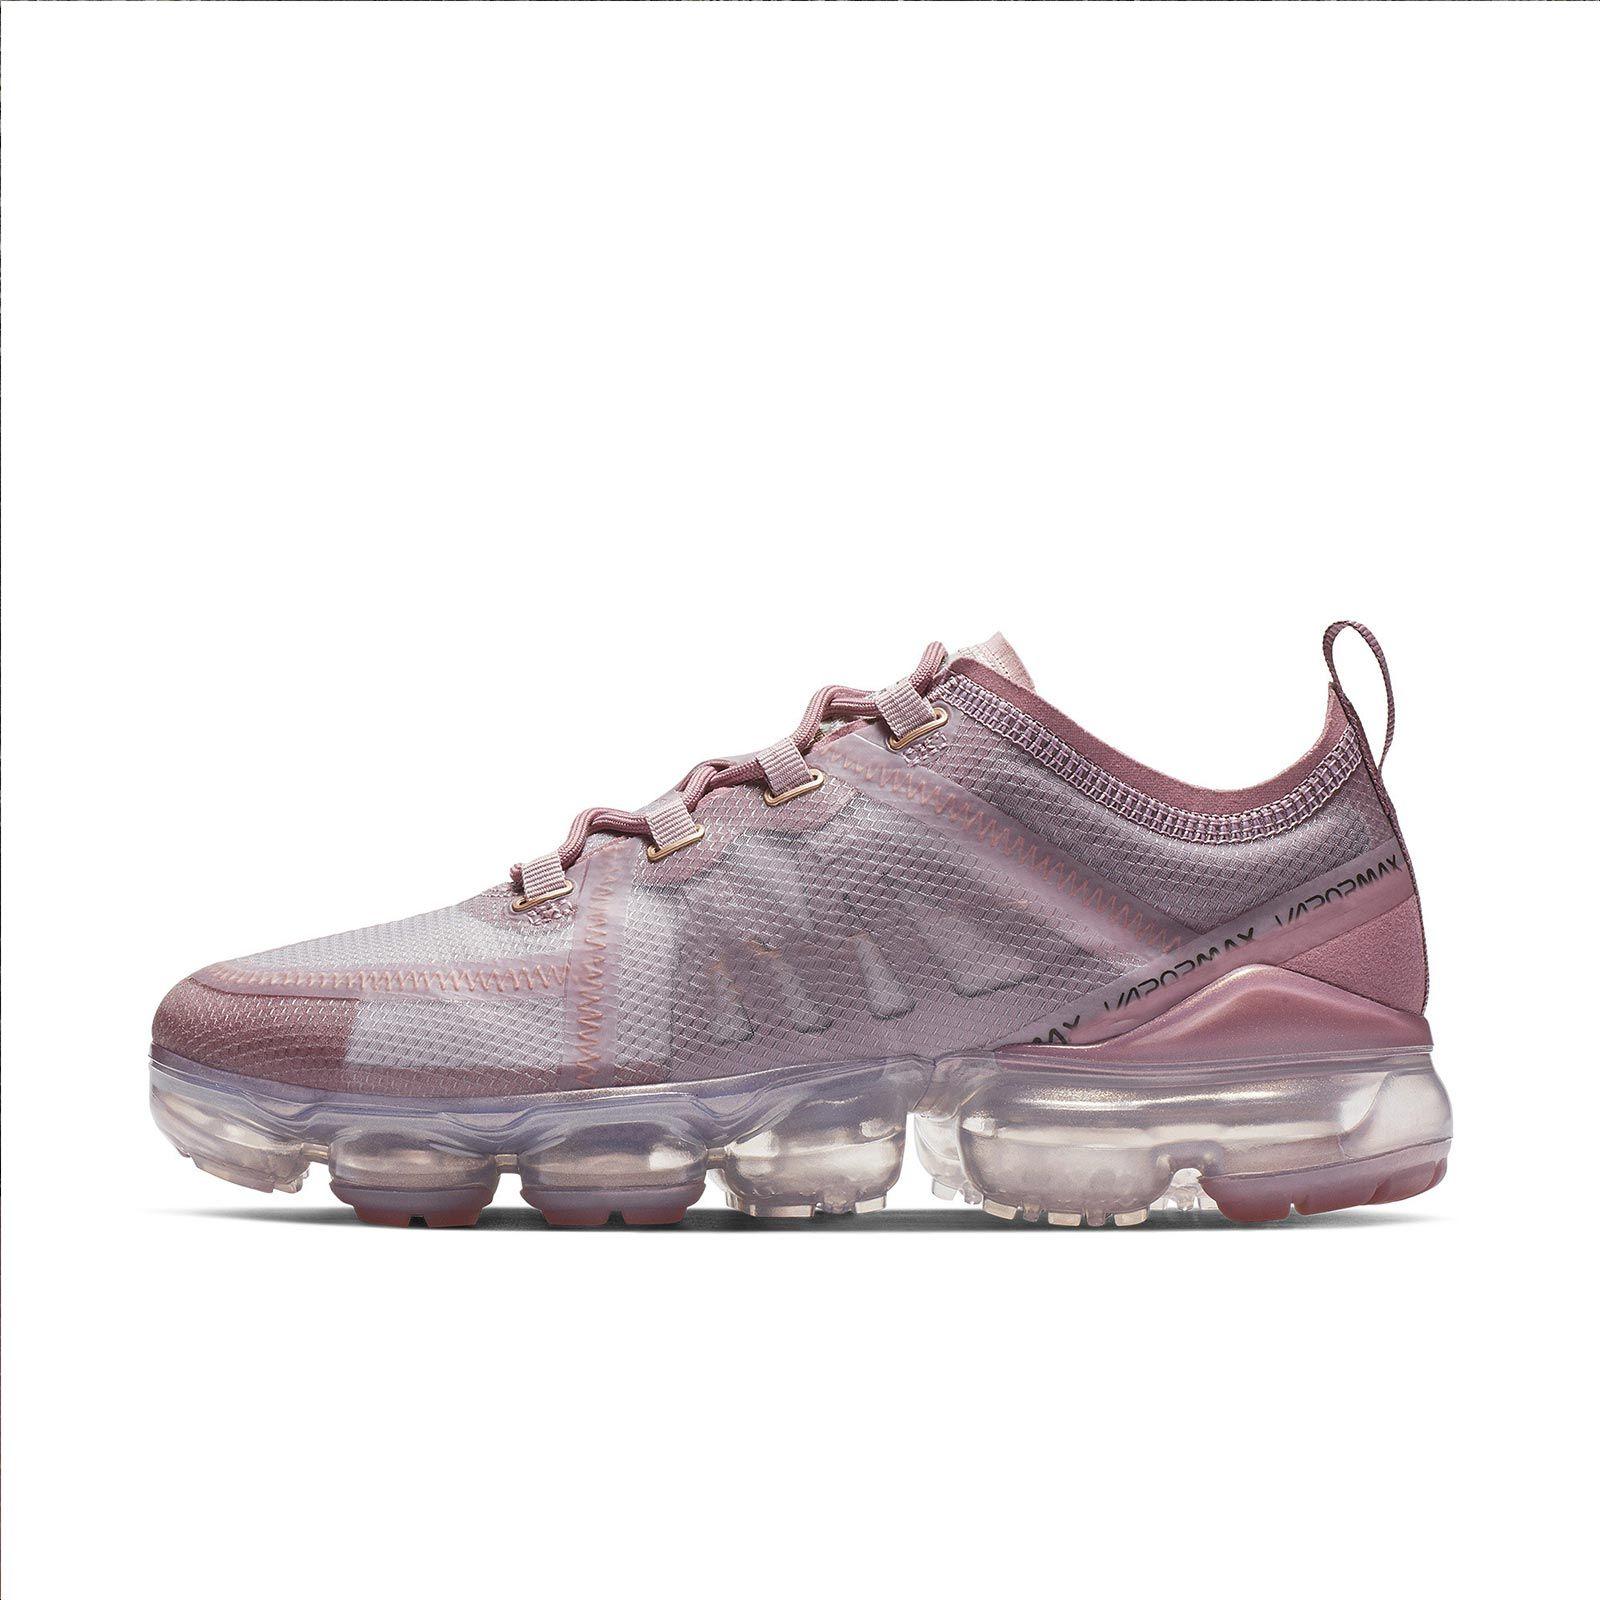 Di 2019 Fk Prm Ginnastica Tn Vapormax Moda Athletic Air Femminile Da Sneakers Corsa Acquista Sport Donna Top Scarpe Plus Nike f6Ib7gvYy